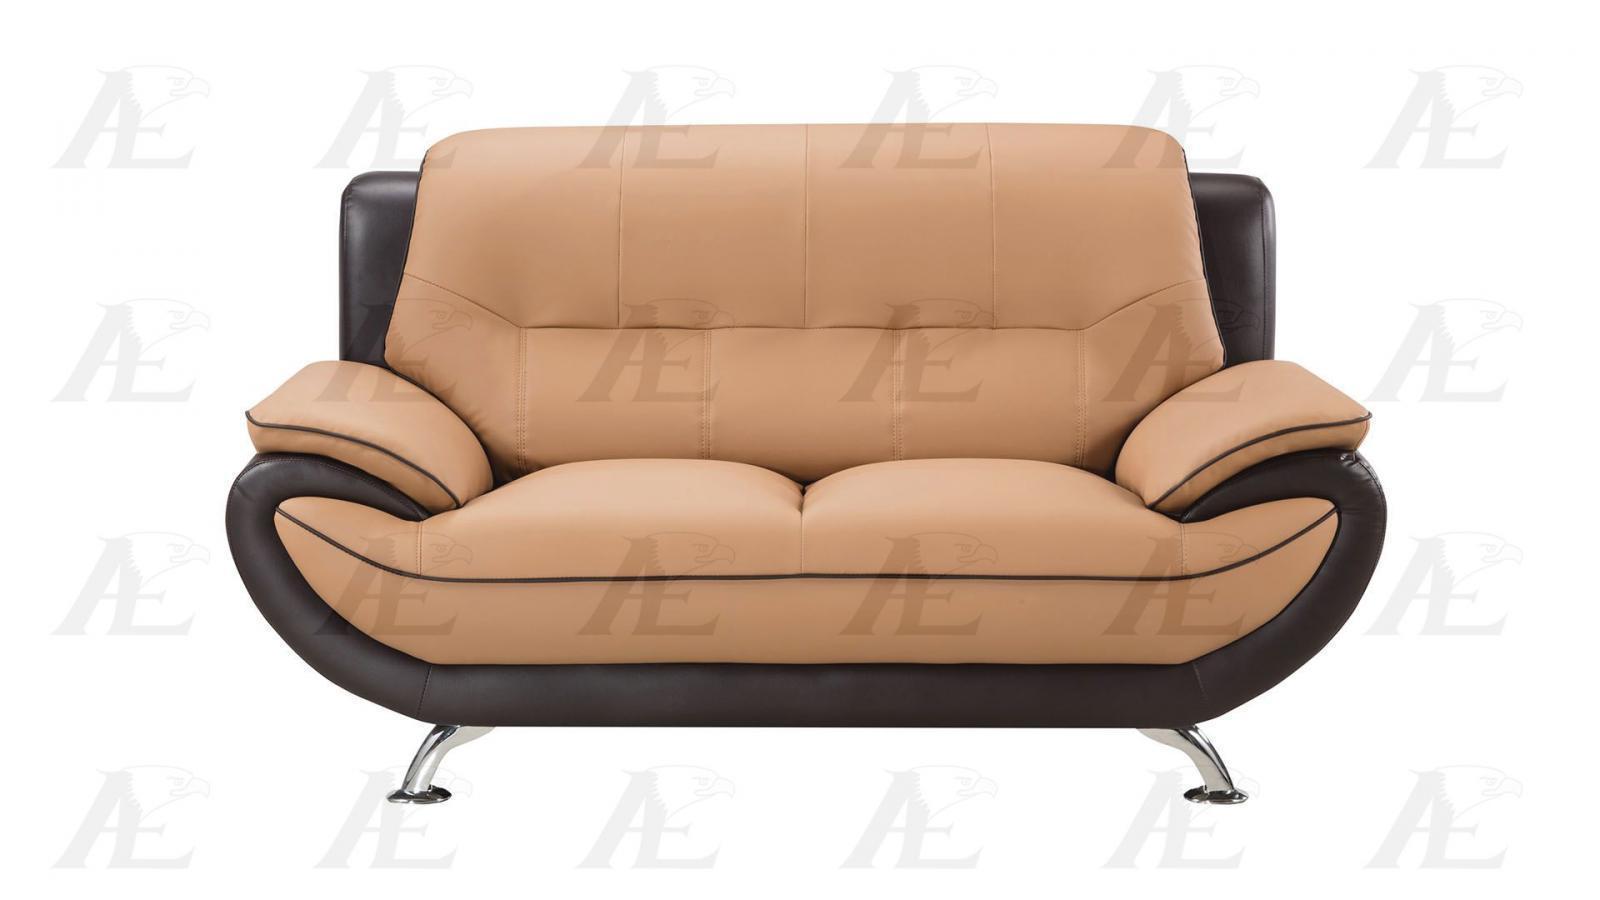 American Eagle Furniture Ae208 Sofa Loveseat And Chair